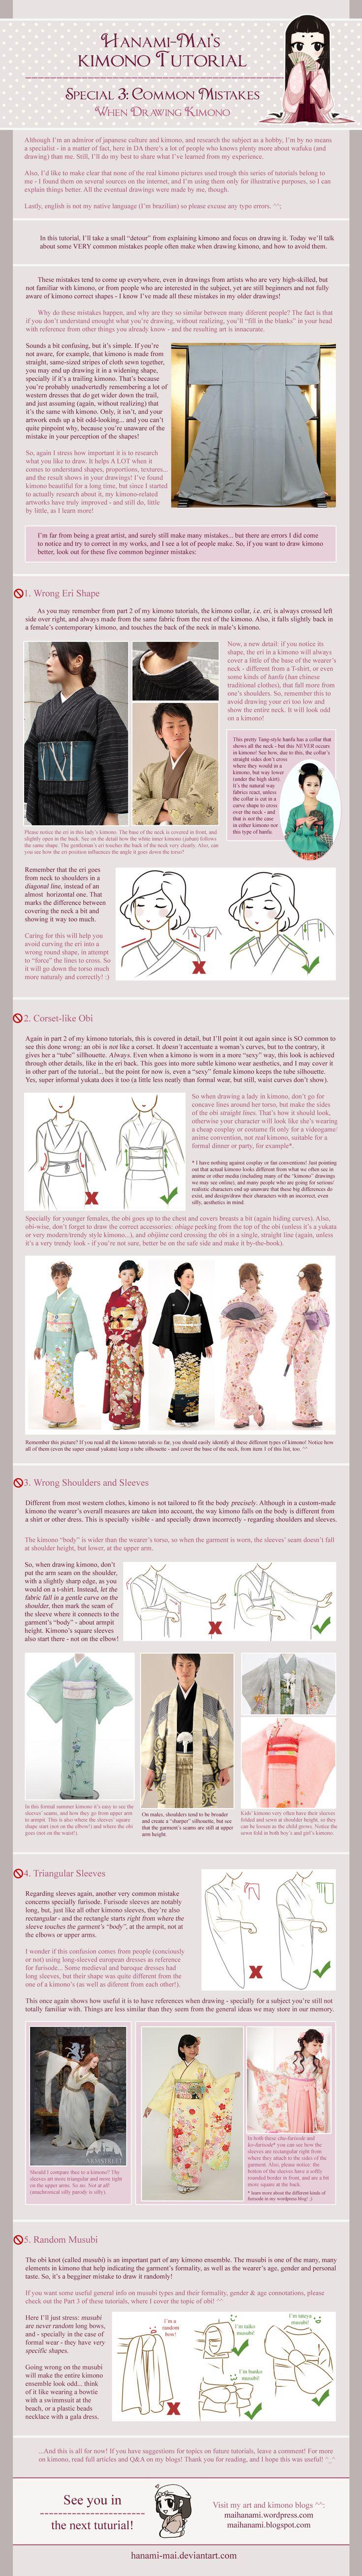 Kimono Tutorial - Drawing Mistakes Special by Hanami-Mai